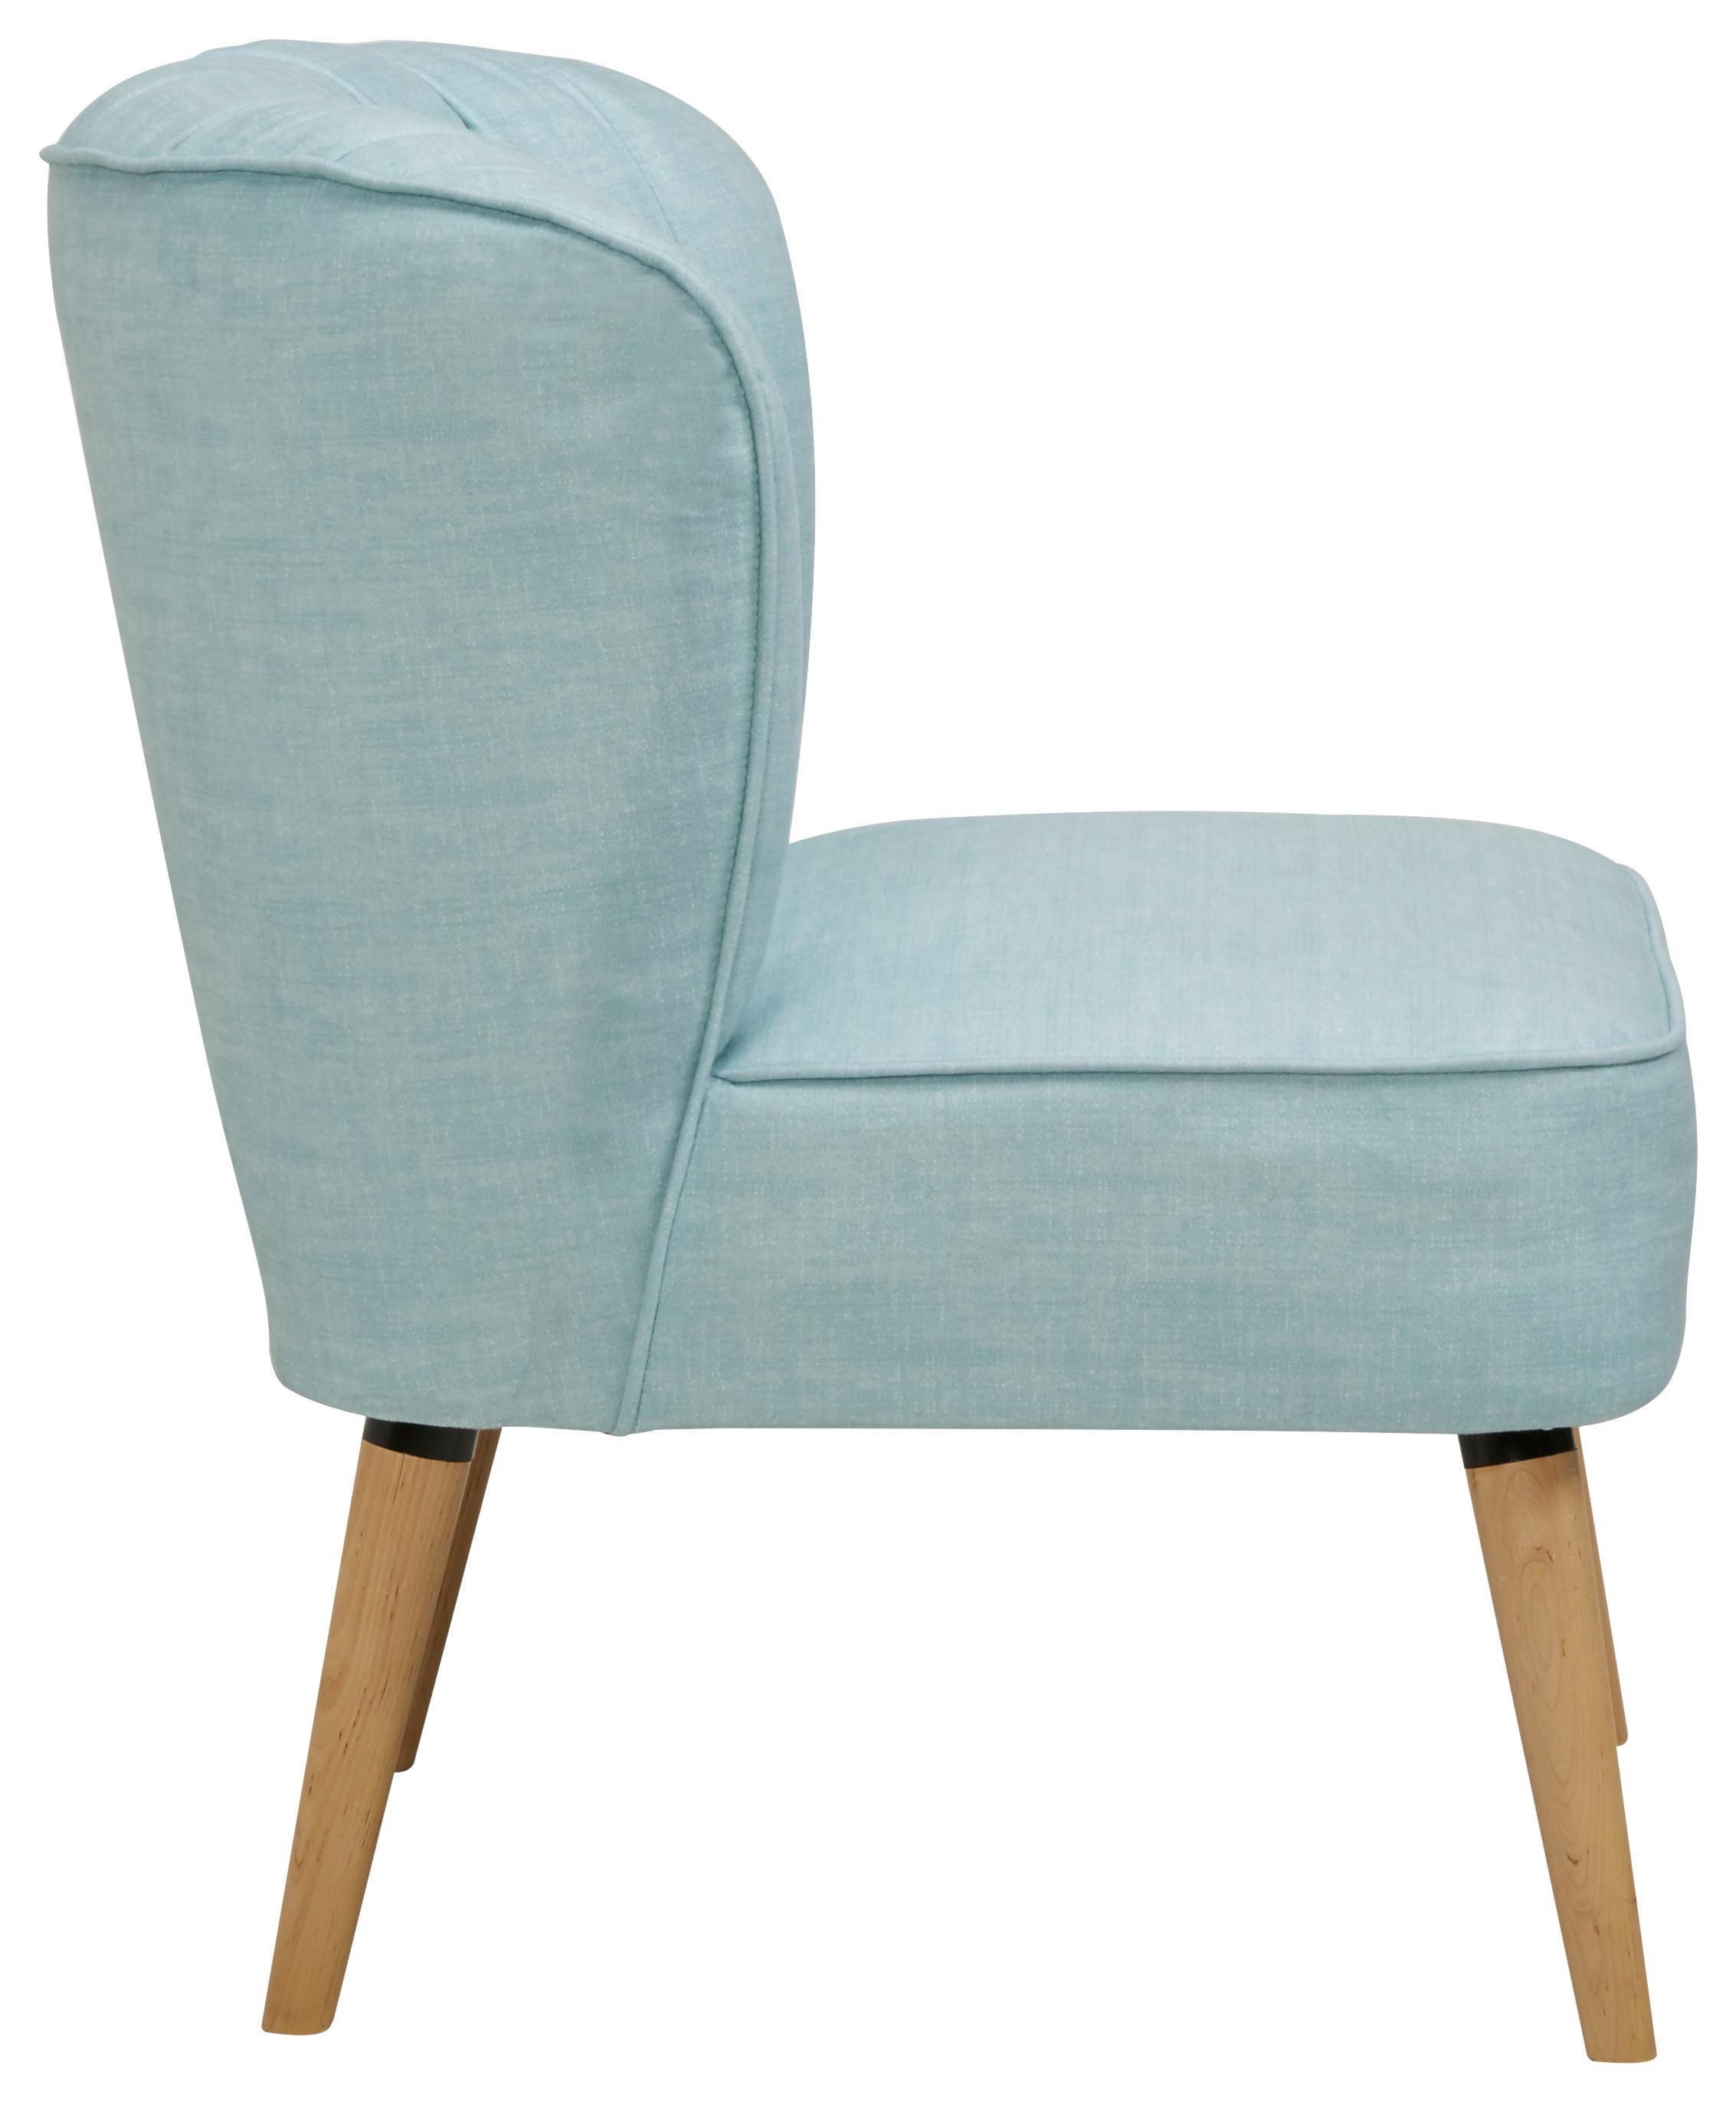 Sessel in Aqua - Blau/Naturfarben, MODERN, Holz/Holzwerkstoff (75/63/83cm) - MÖMAX modern living